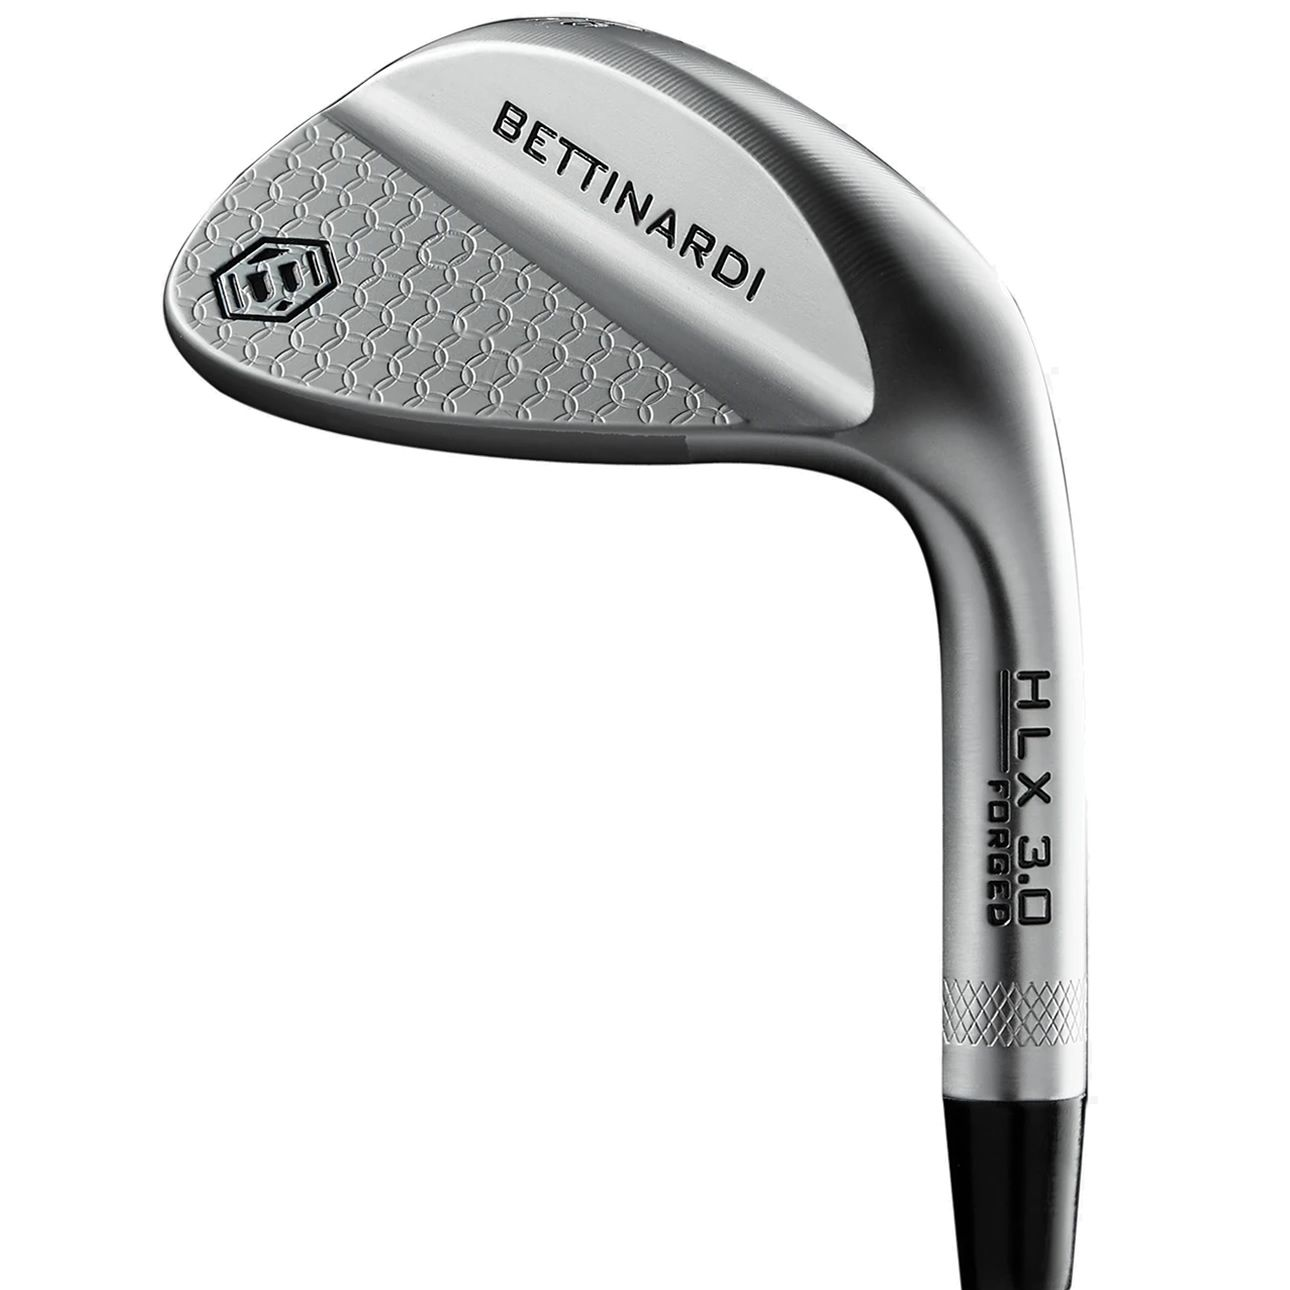 Bettinardi HLX 3.0 Golf Wedge Chrome